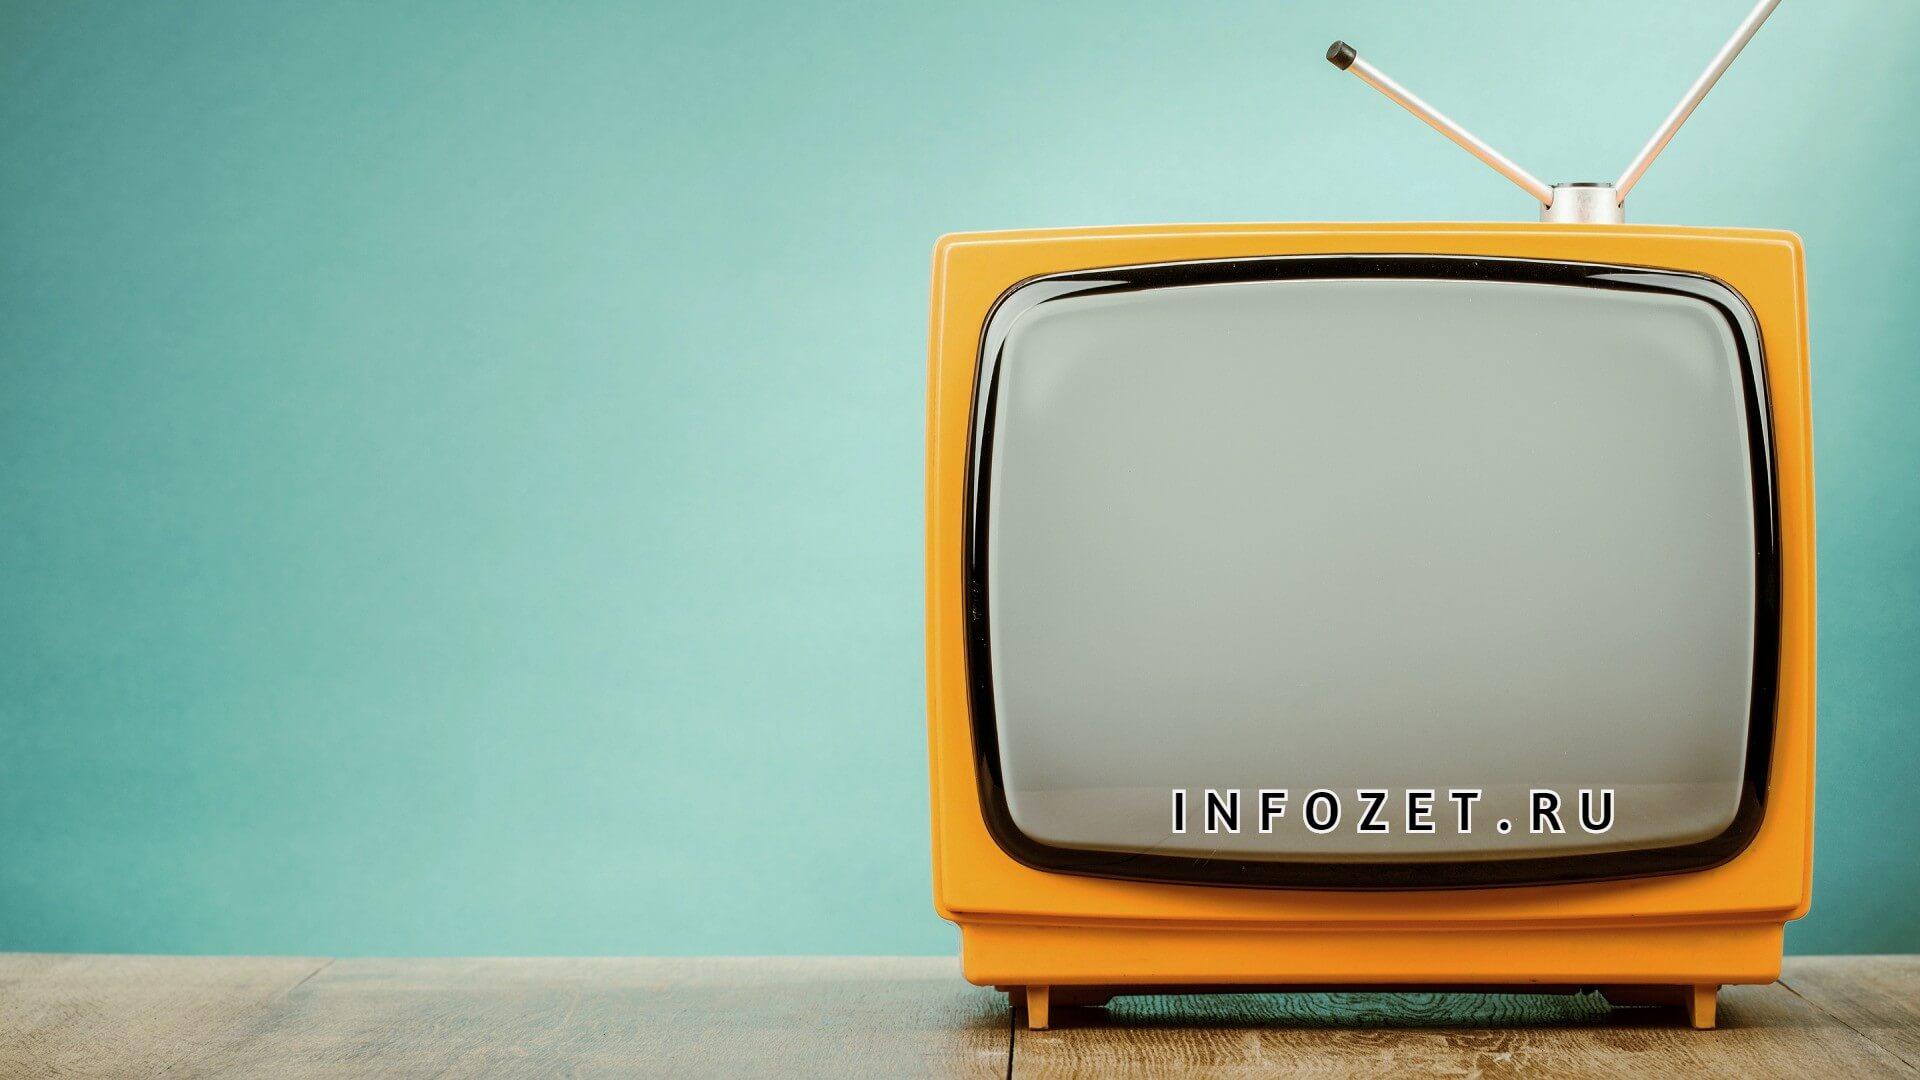 kak-vibrat-televizor-dla-doma